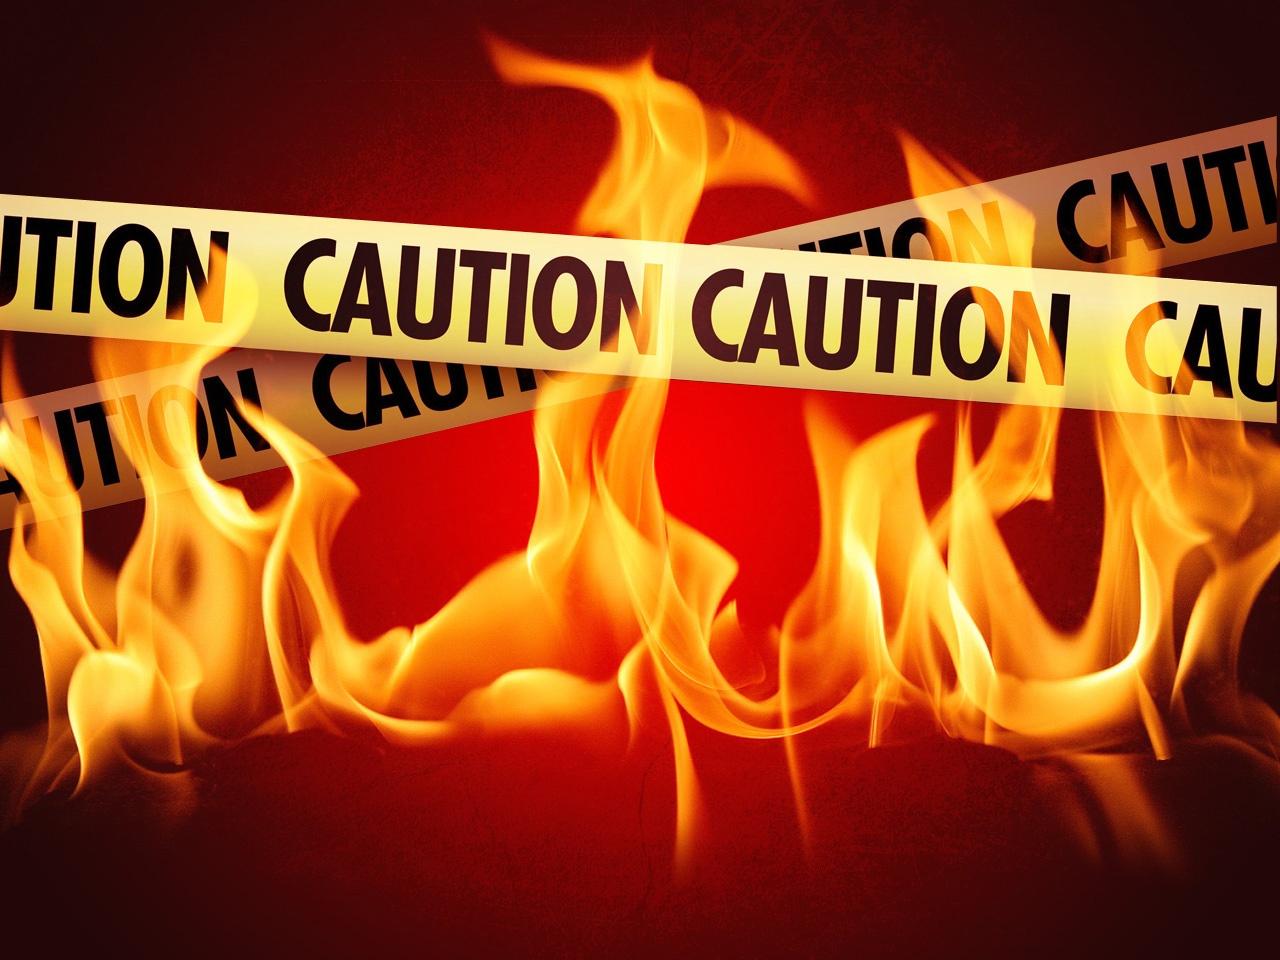 Fire investigation__1544738125818.jpg.jpg